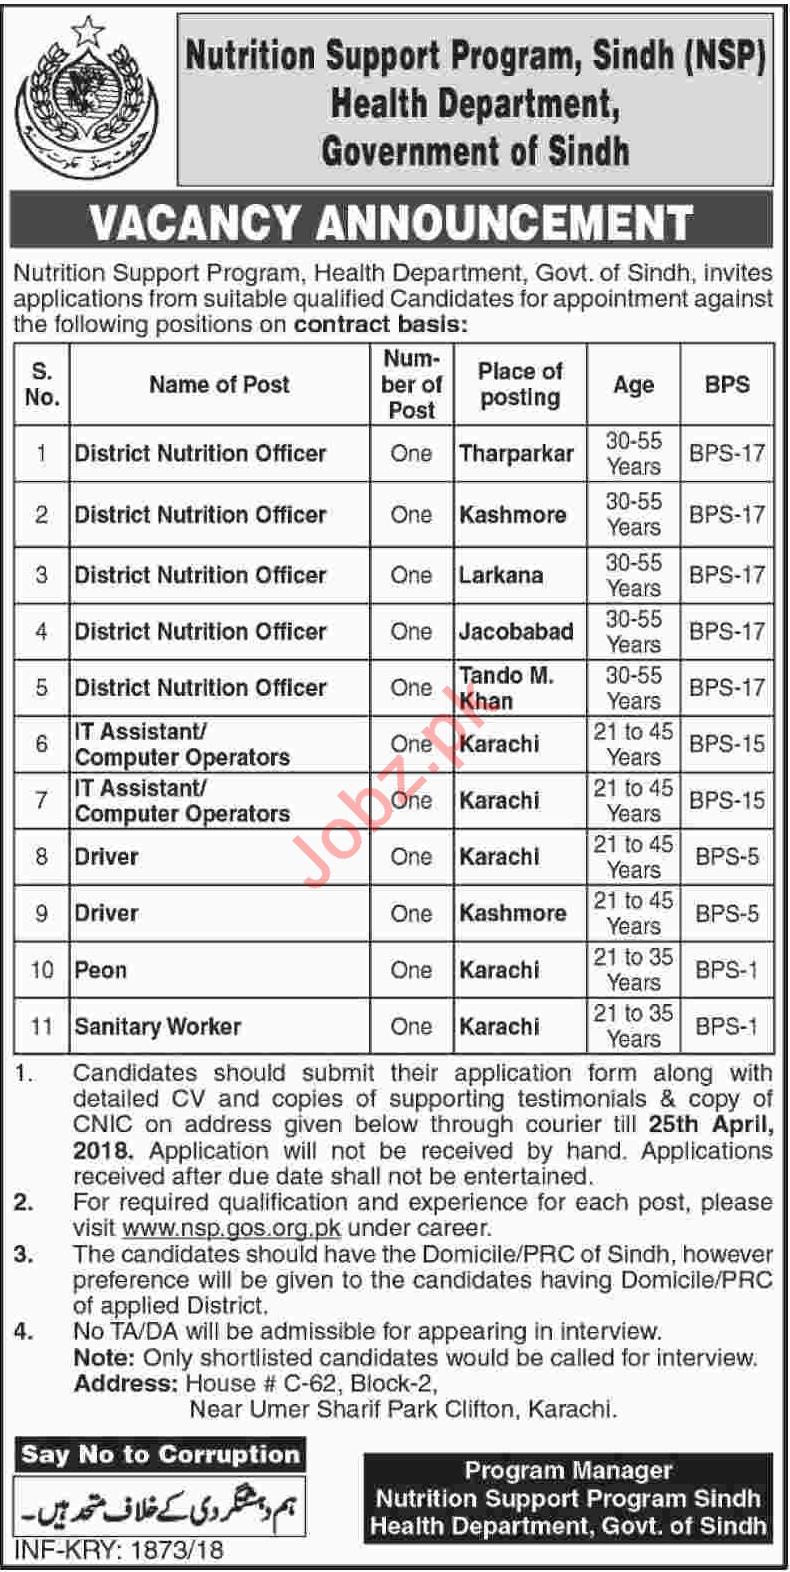 Nutrition Support Program Sindh NSP Health Department Jobs